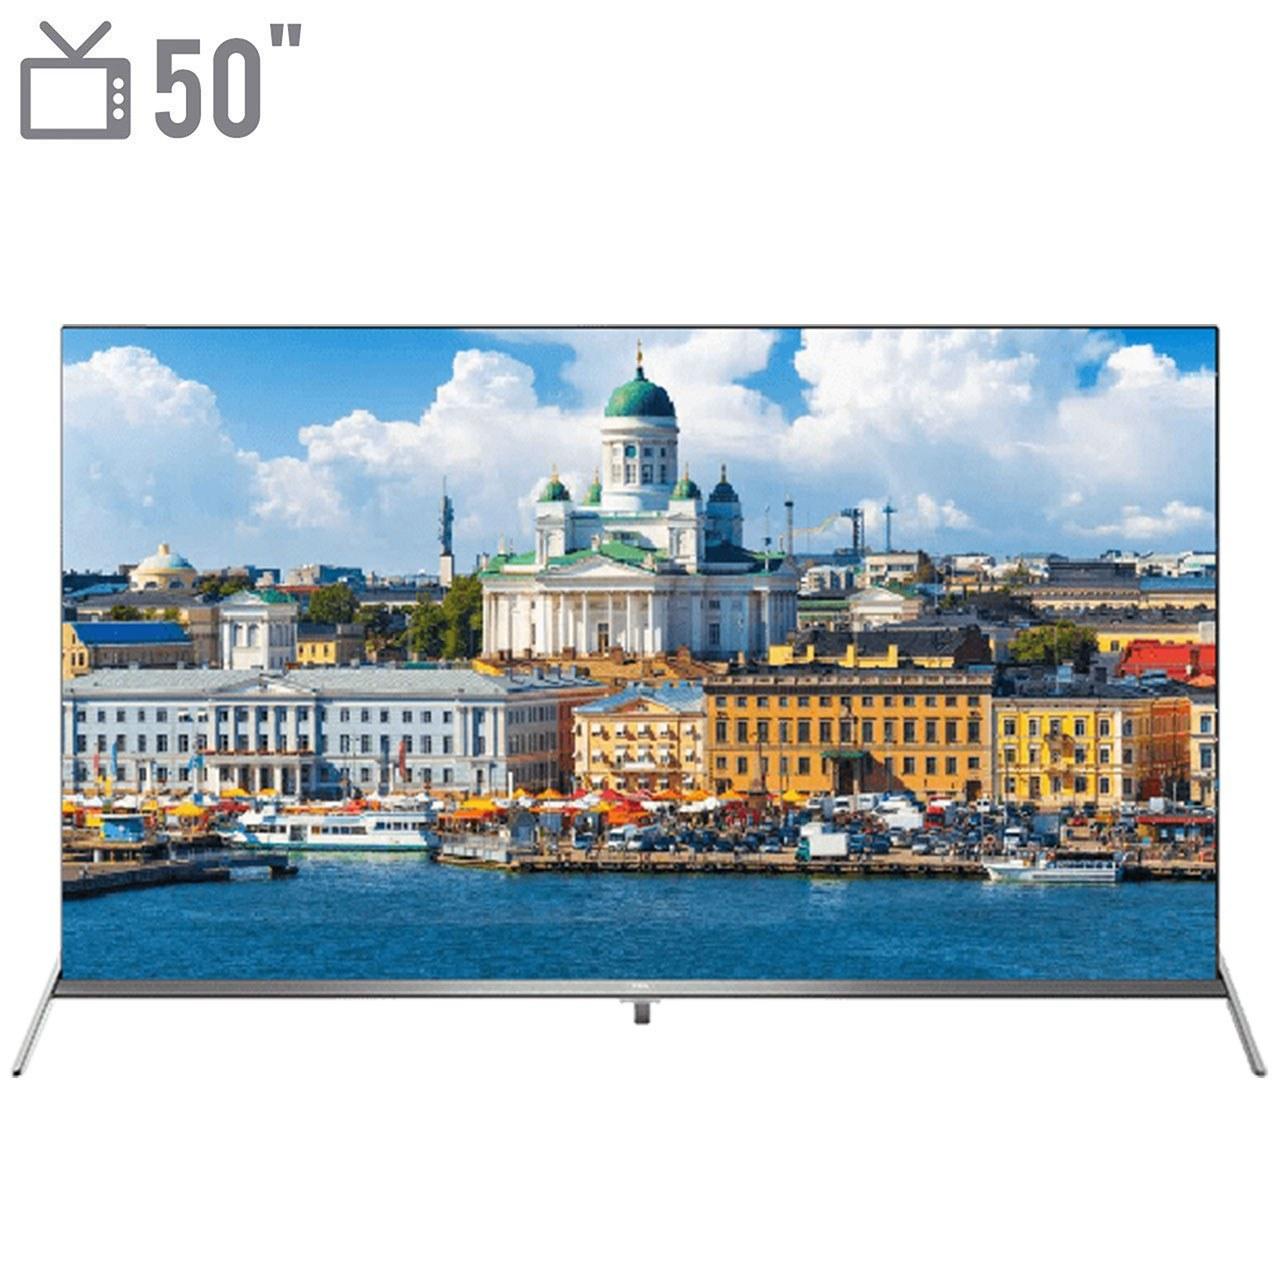 تصویر تلویزیون ال ای دی TCL مدل 50P8S 50P8S Ultra HD-4K